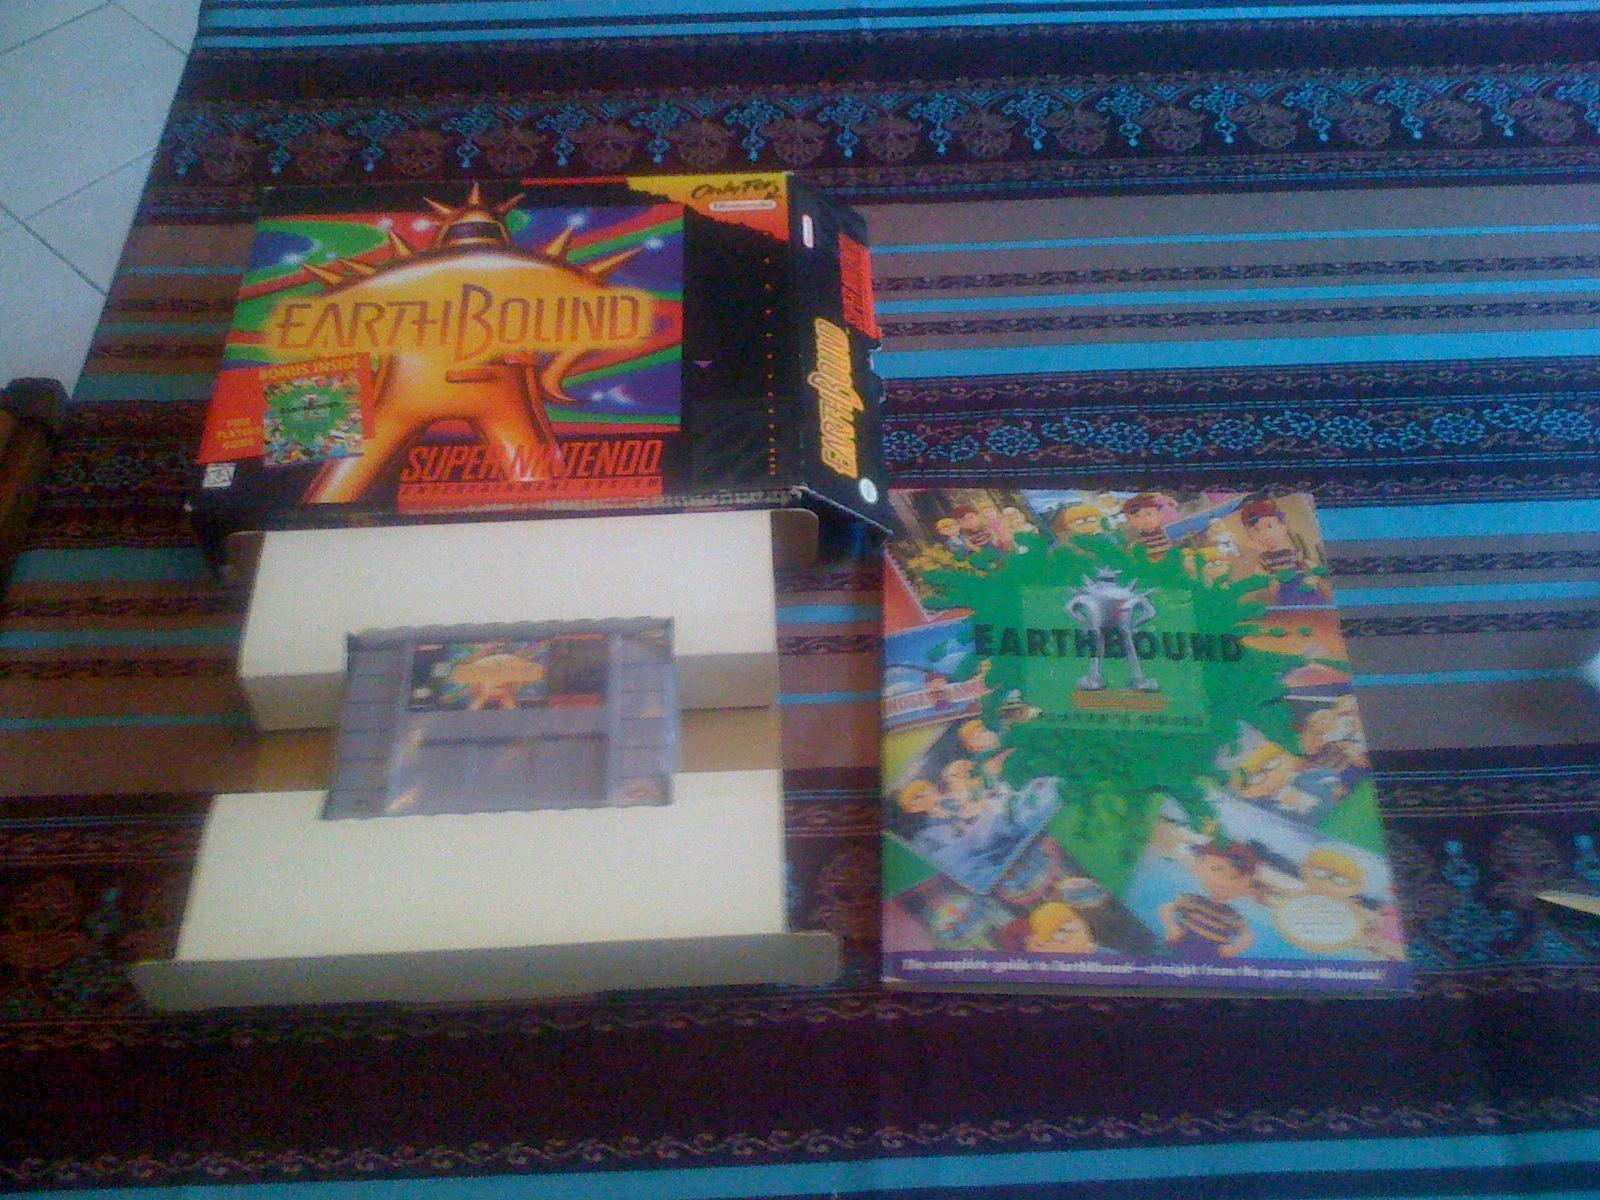 La collection de Jungrock (maj juillet 2016) : Super rentrée Game Boy 778739IMG0171